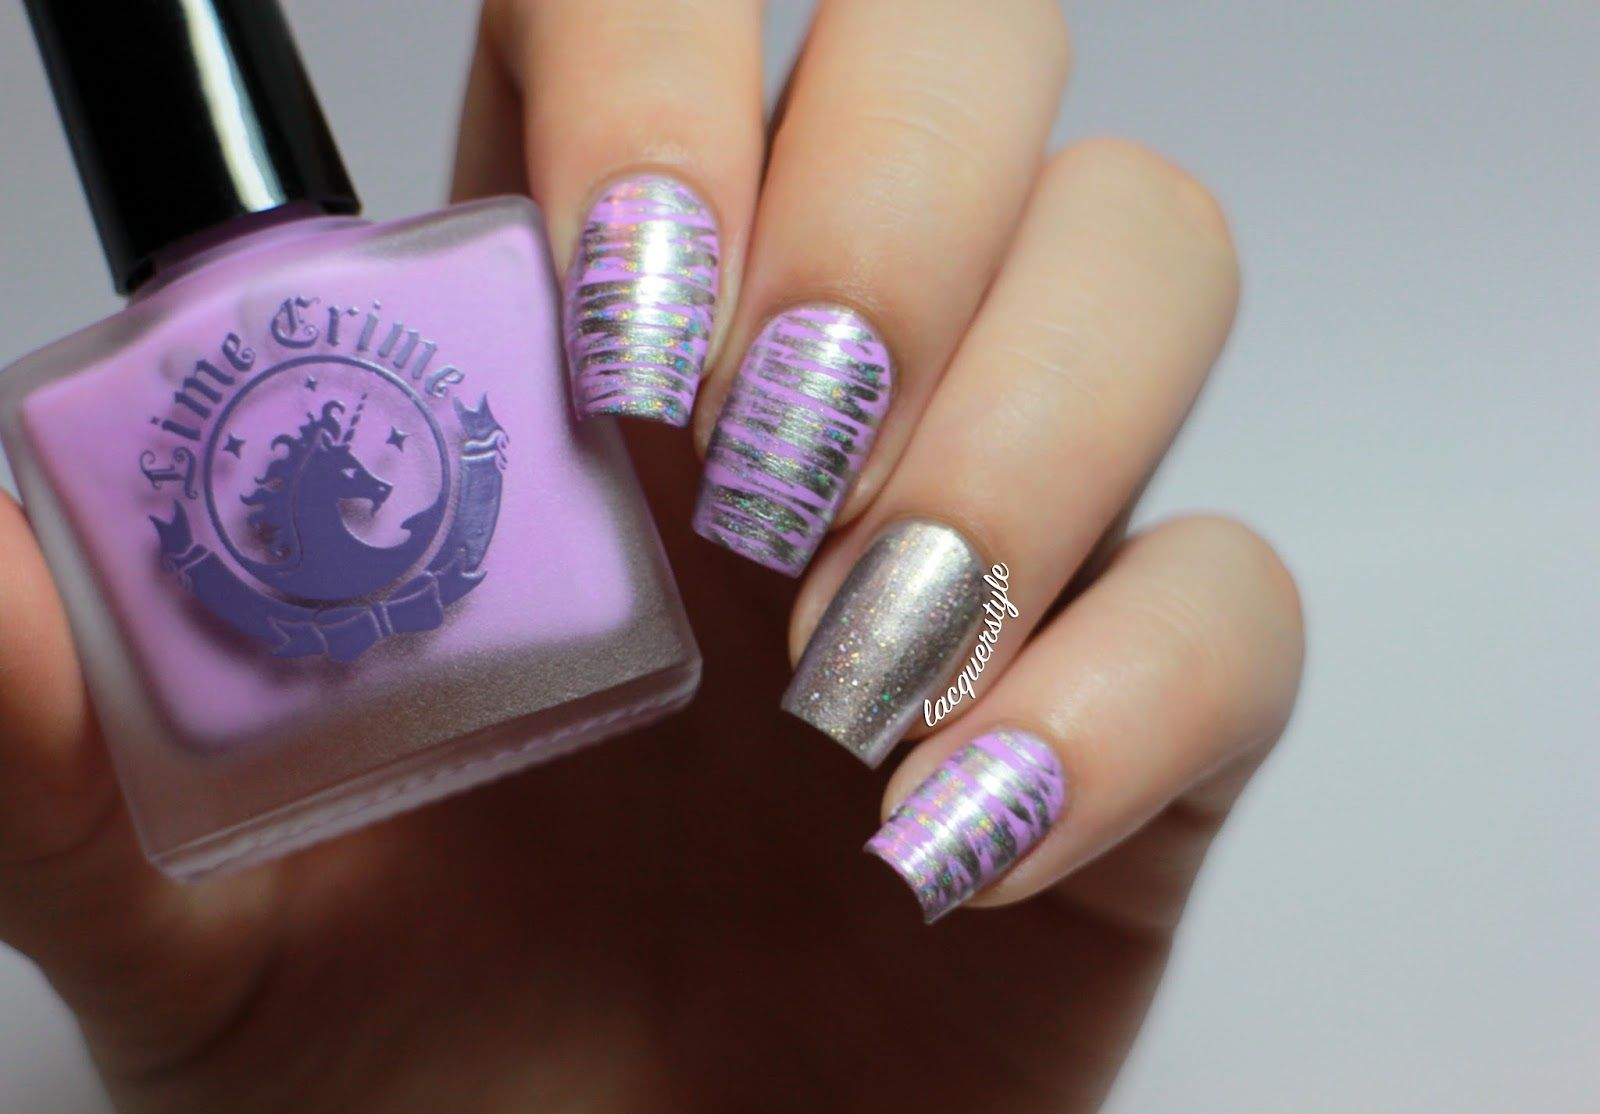 Fan Brush Nail Art + Tutorial! | Nails | Pinterest | Fan brush nails ...